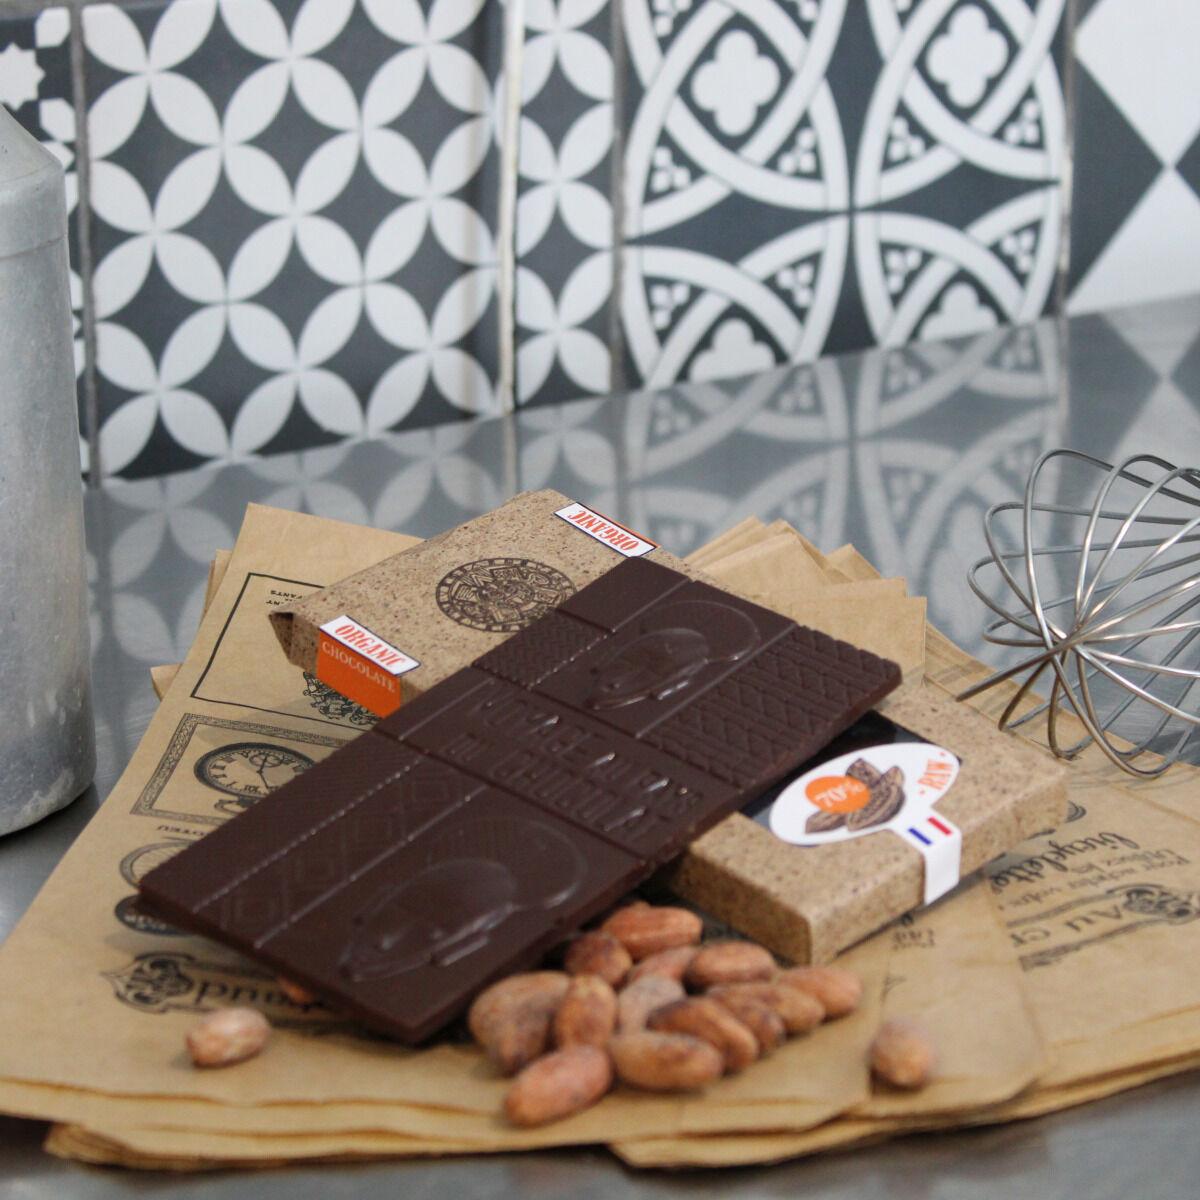 Le Petit Atelier Tablette Chocolat Cru 70% Origine Pur Pérou